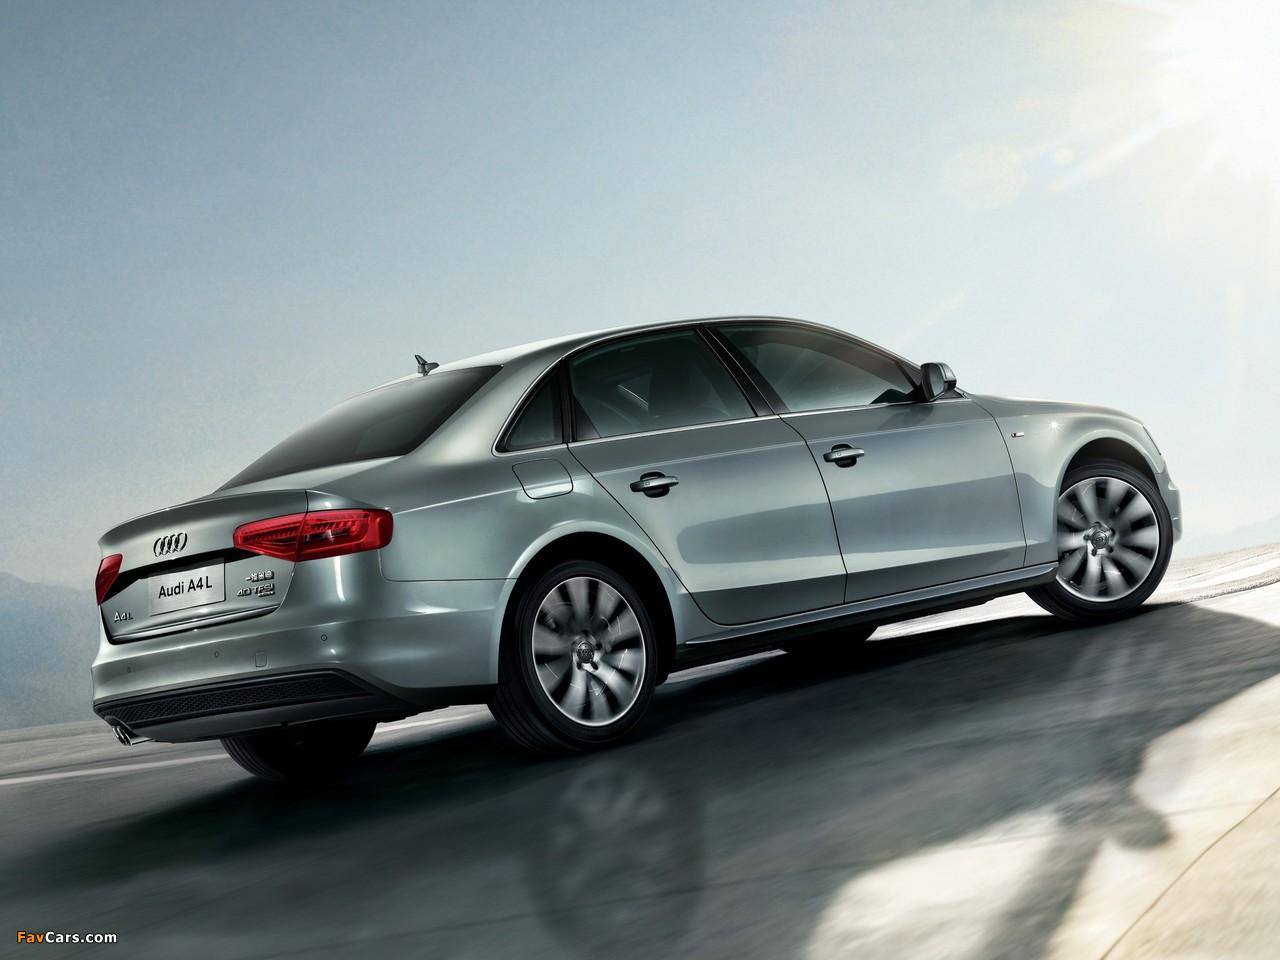 Images Of Audi A4l 40 Tfsi Quattro B8 8k 2012 1280x960